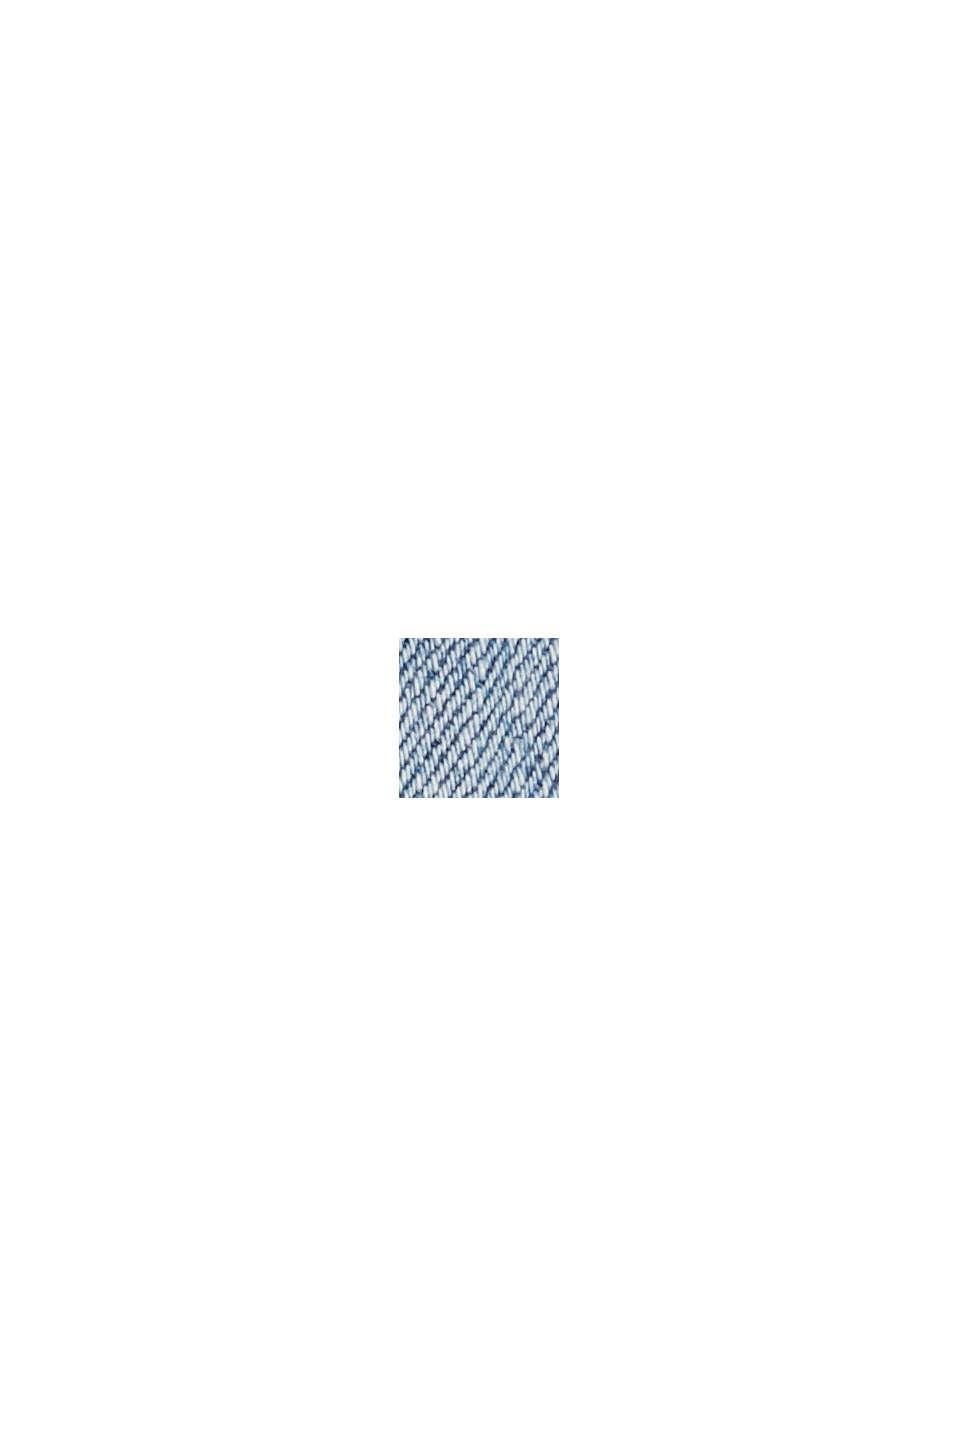 Vaqueros tobilleros con corte moderno, BLUE LIGHT WASHED, swatch